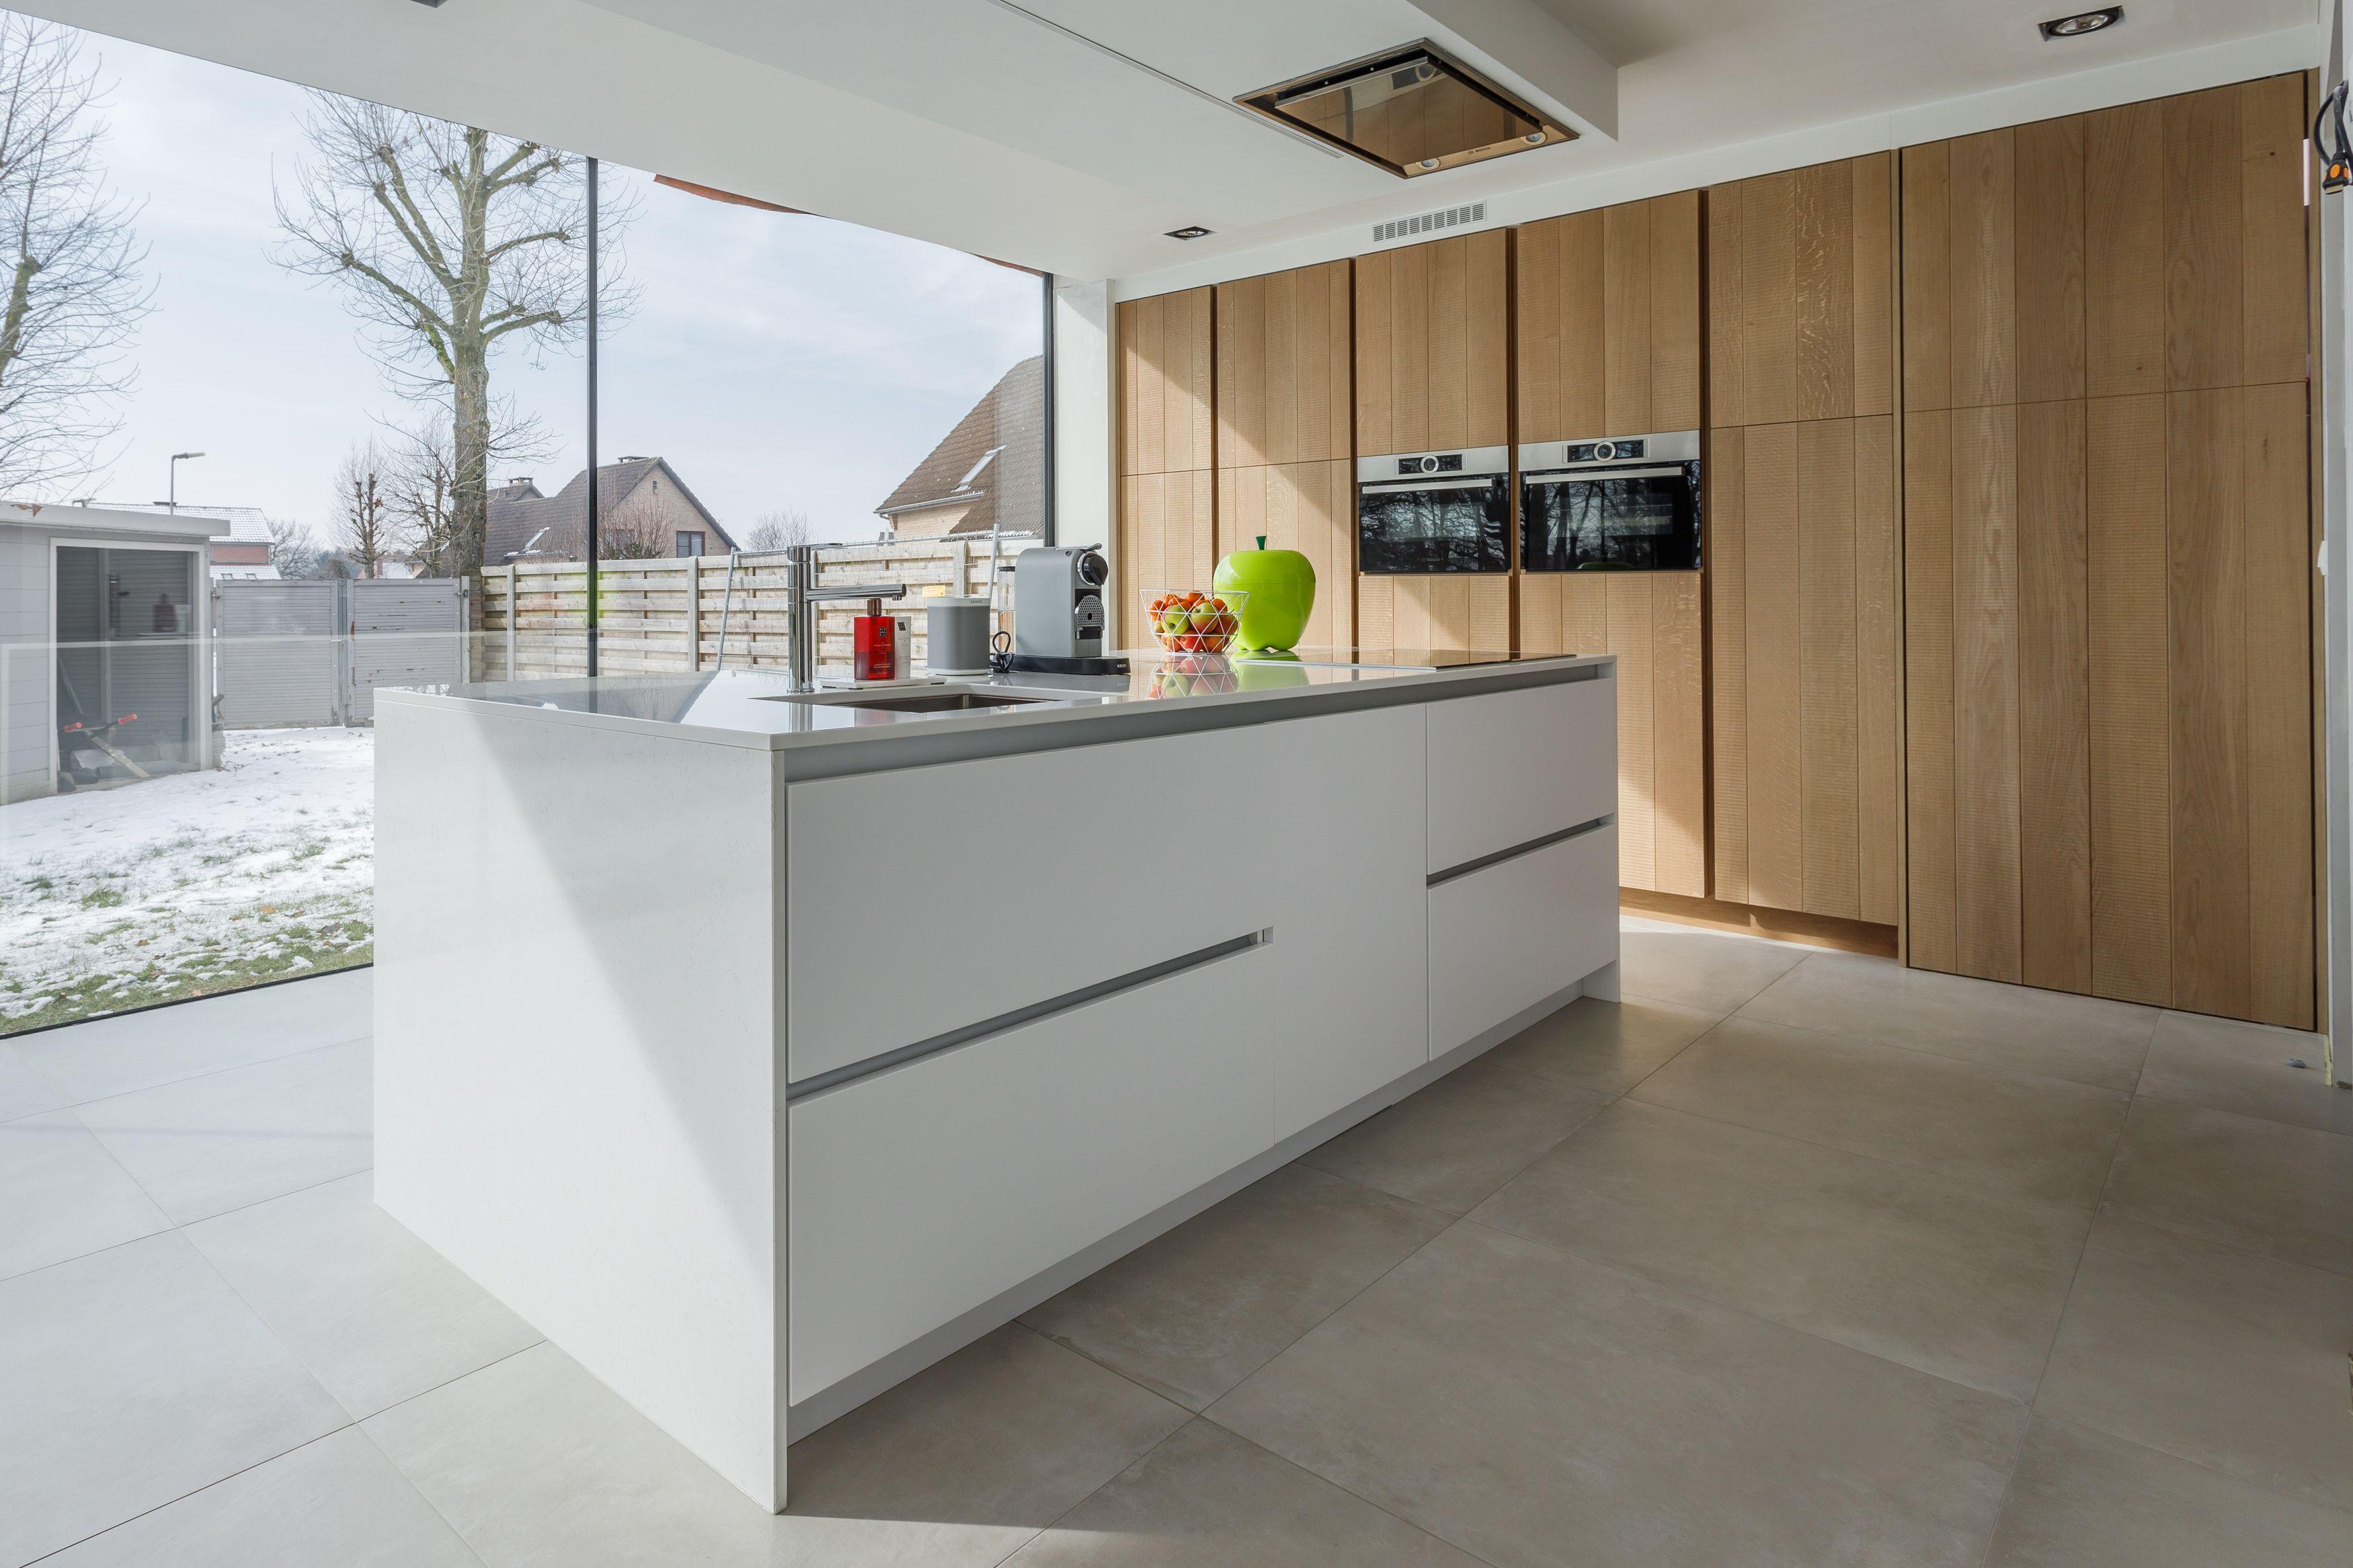 Franssen Keukens Design : Franssen keukens tijdloze keuken tijdloze keukens